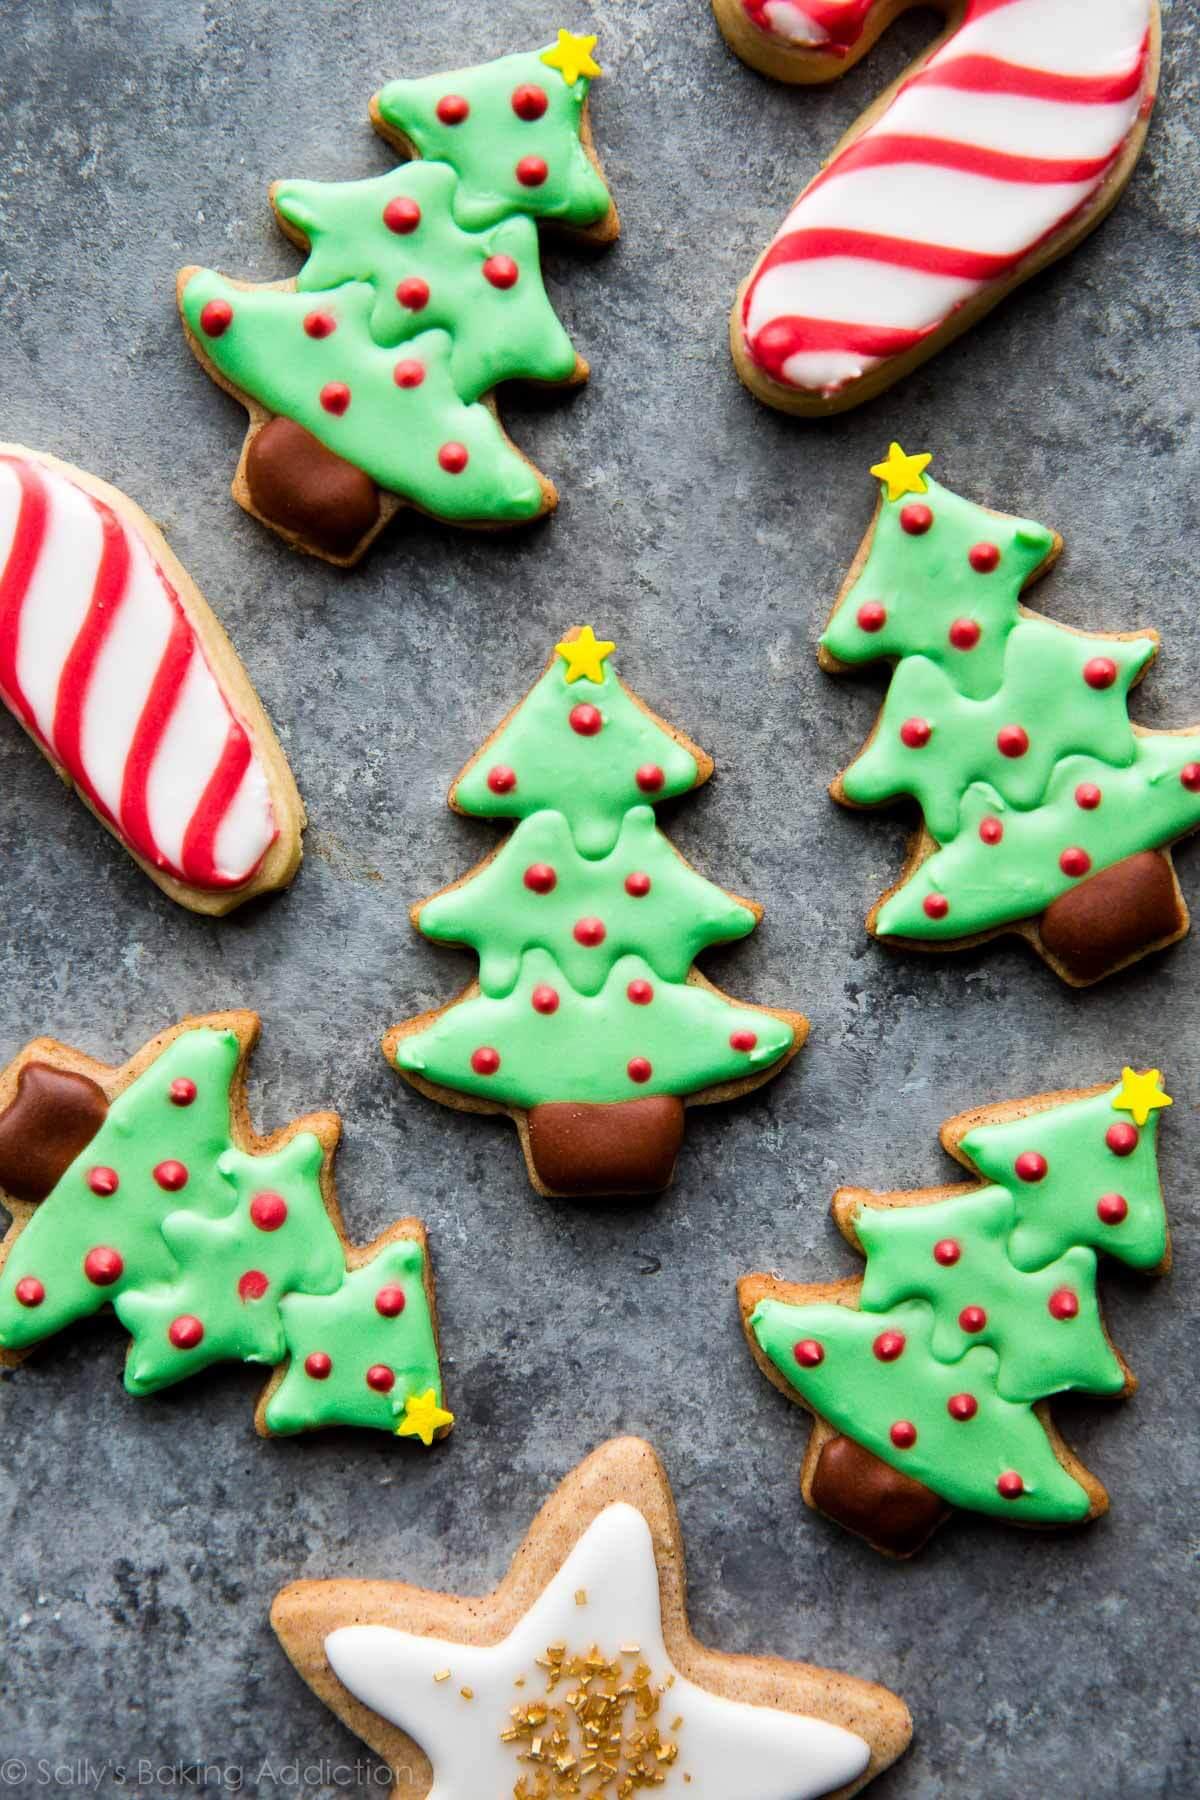 1 Sugar Cookie Dough, 5 Ways to Decorate - Sallys Baking Addiction